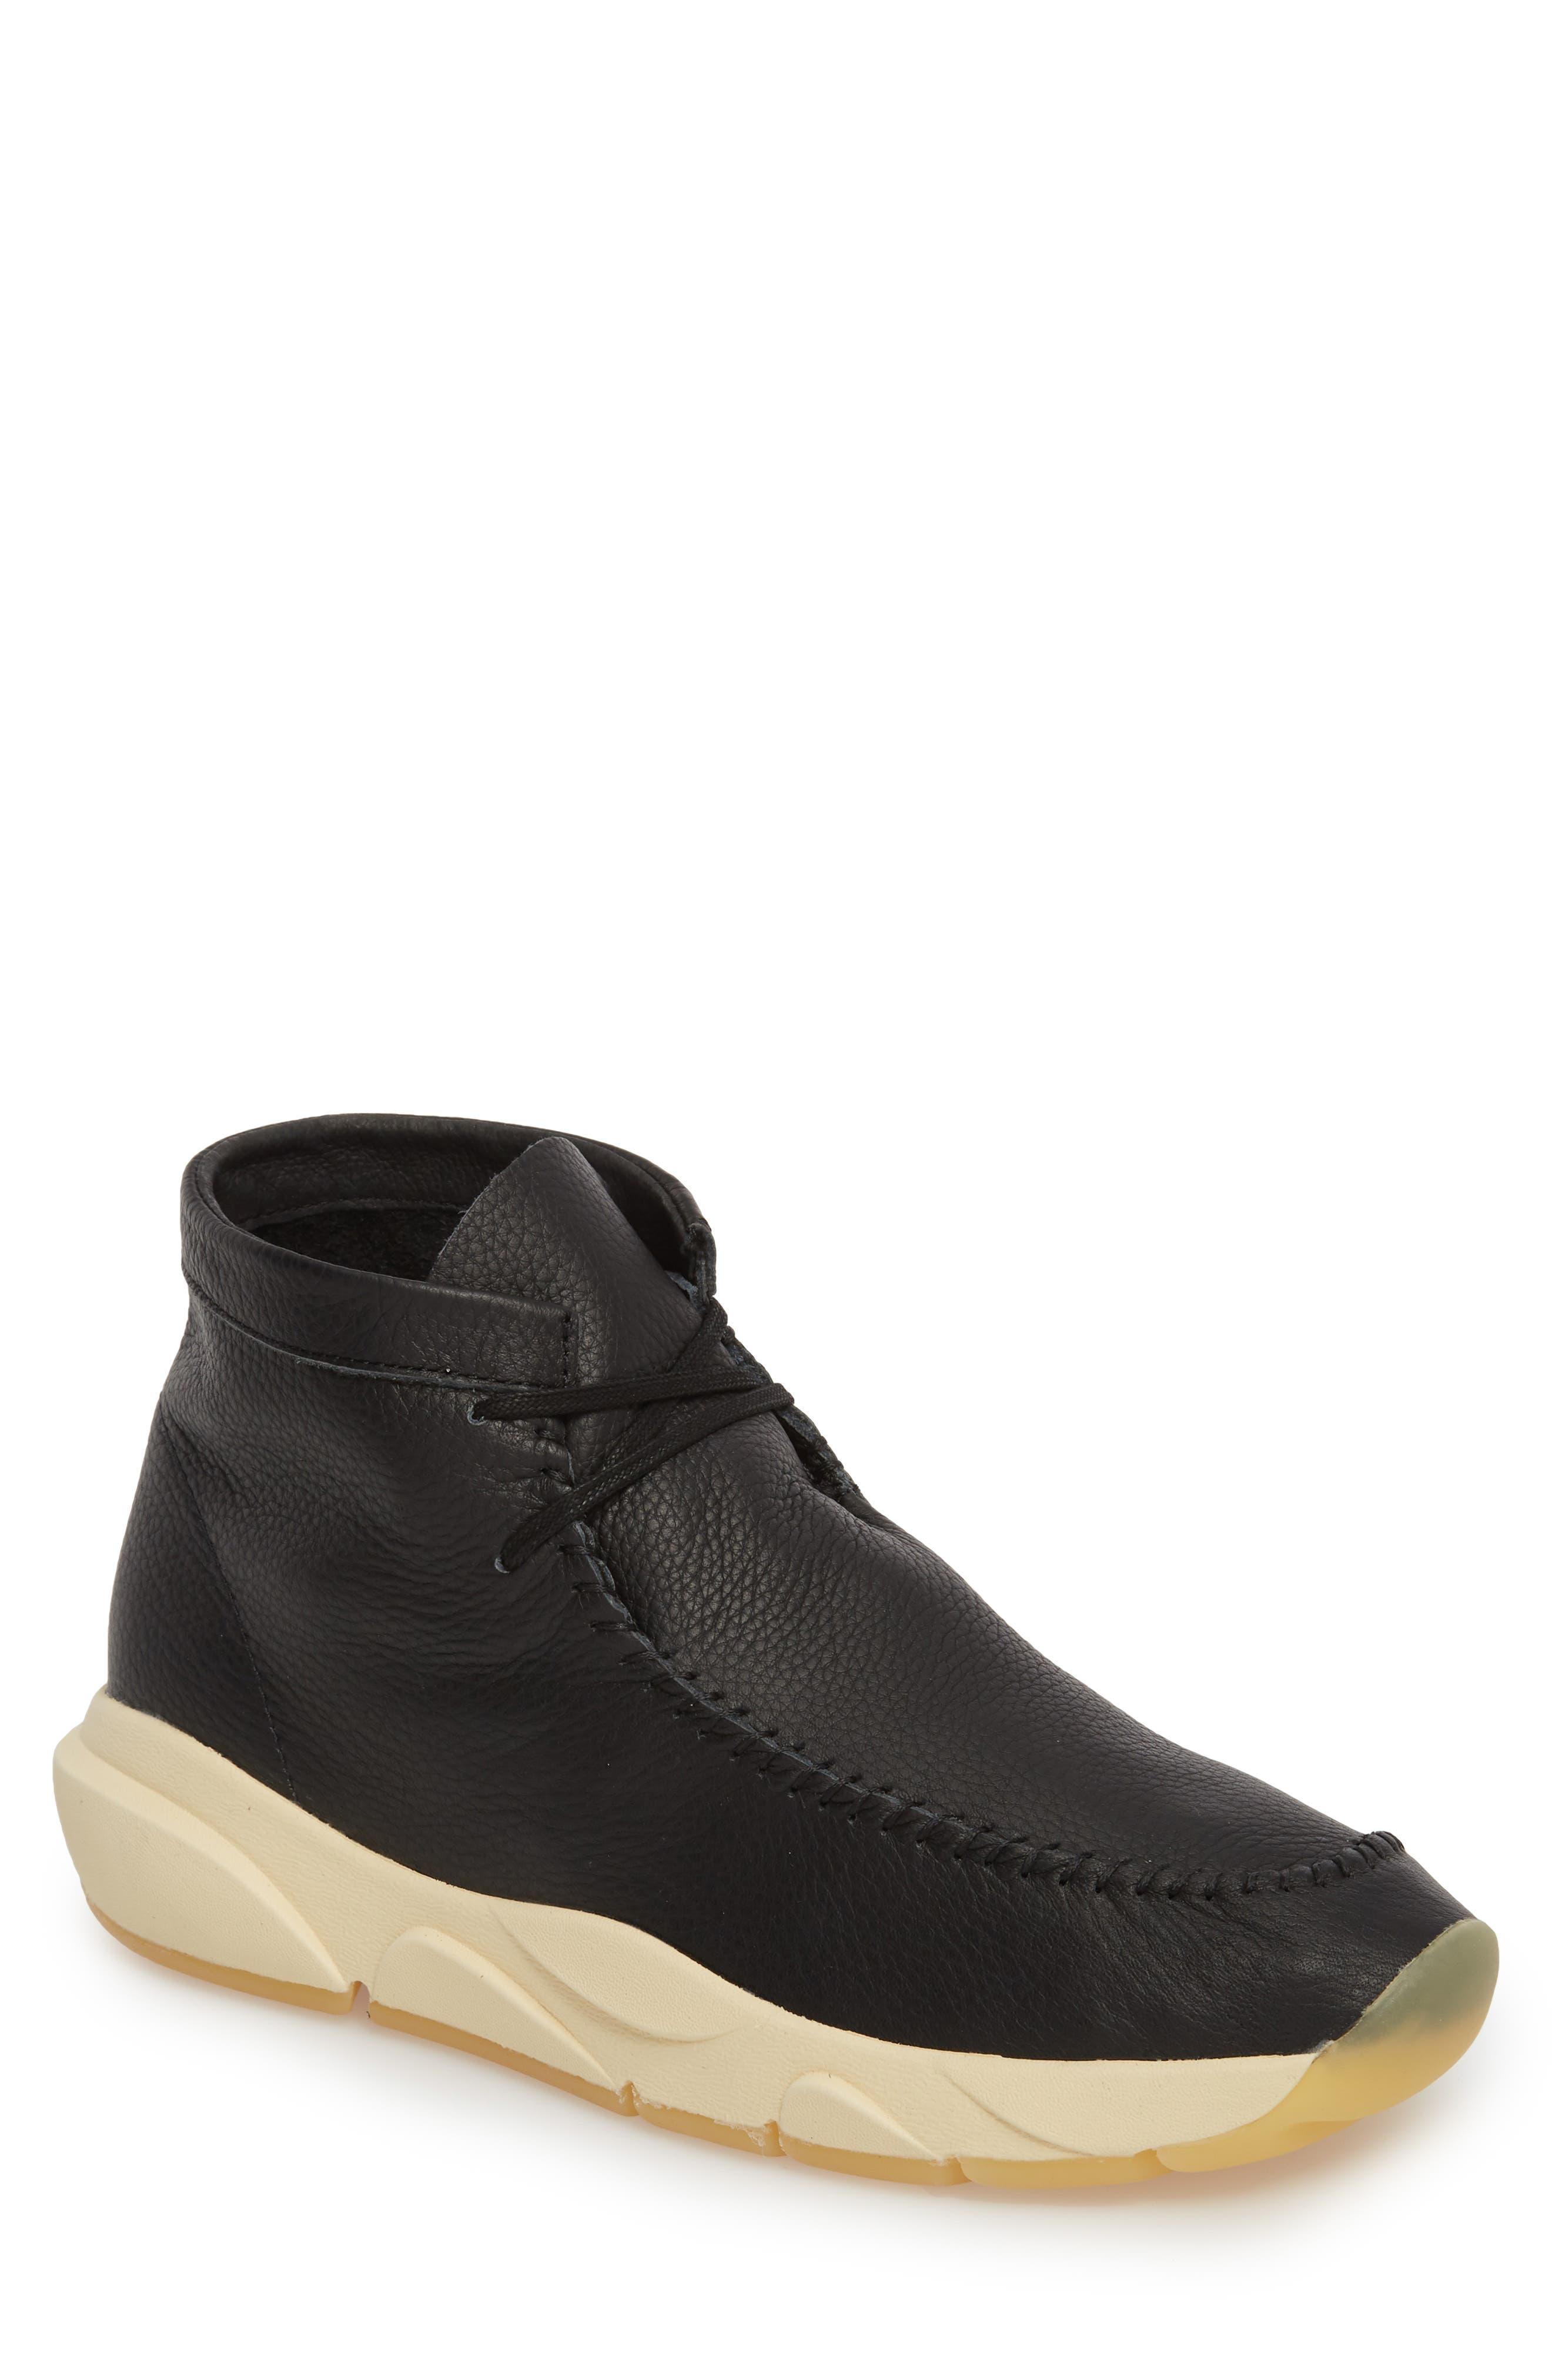 Main Image - Clearweather Castas Asymmetrical Chukka Sneaker (Men)